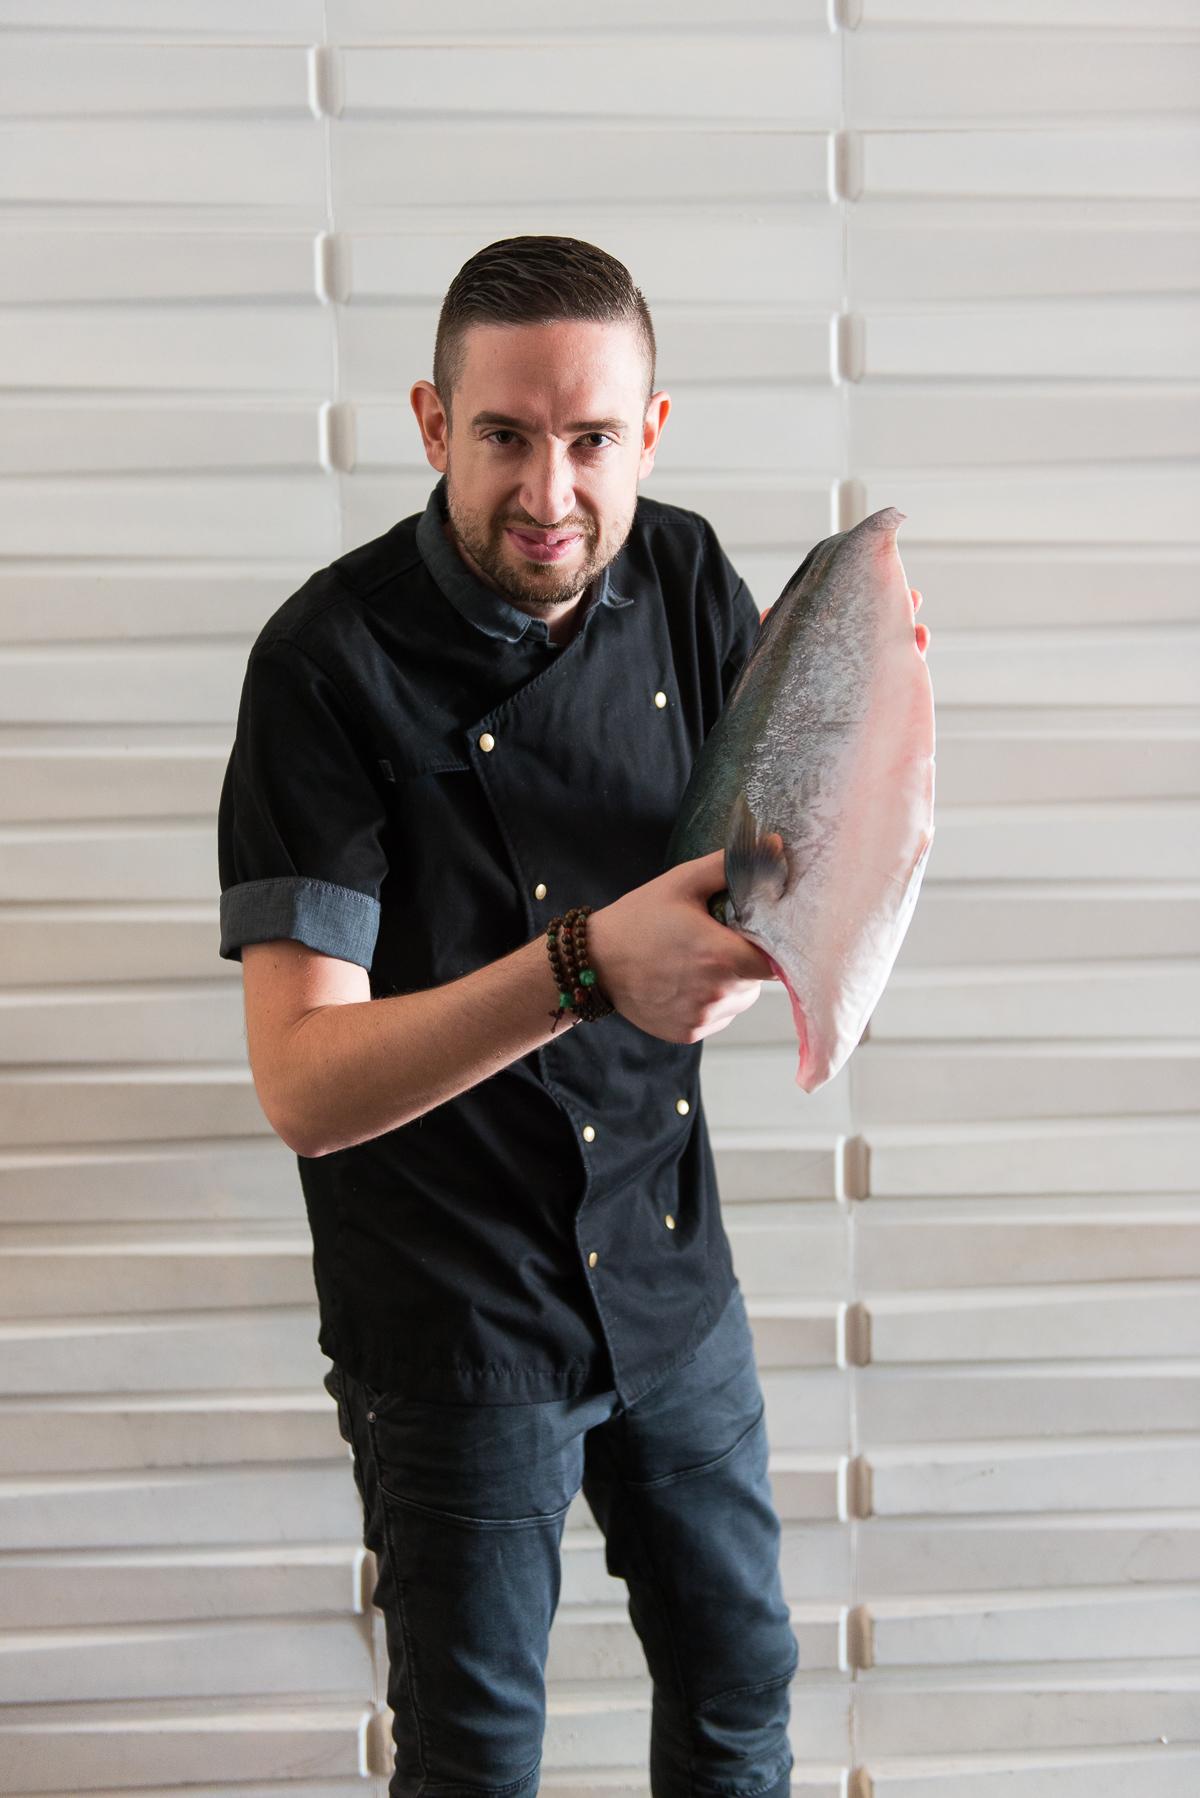 20171117_KennethAlexanderScott_Venue Sushi Web Ready-4